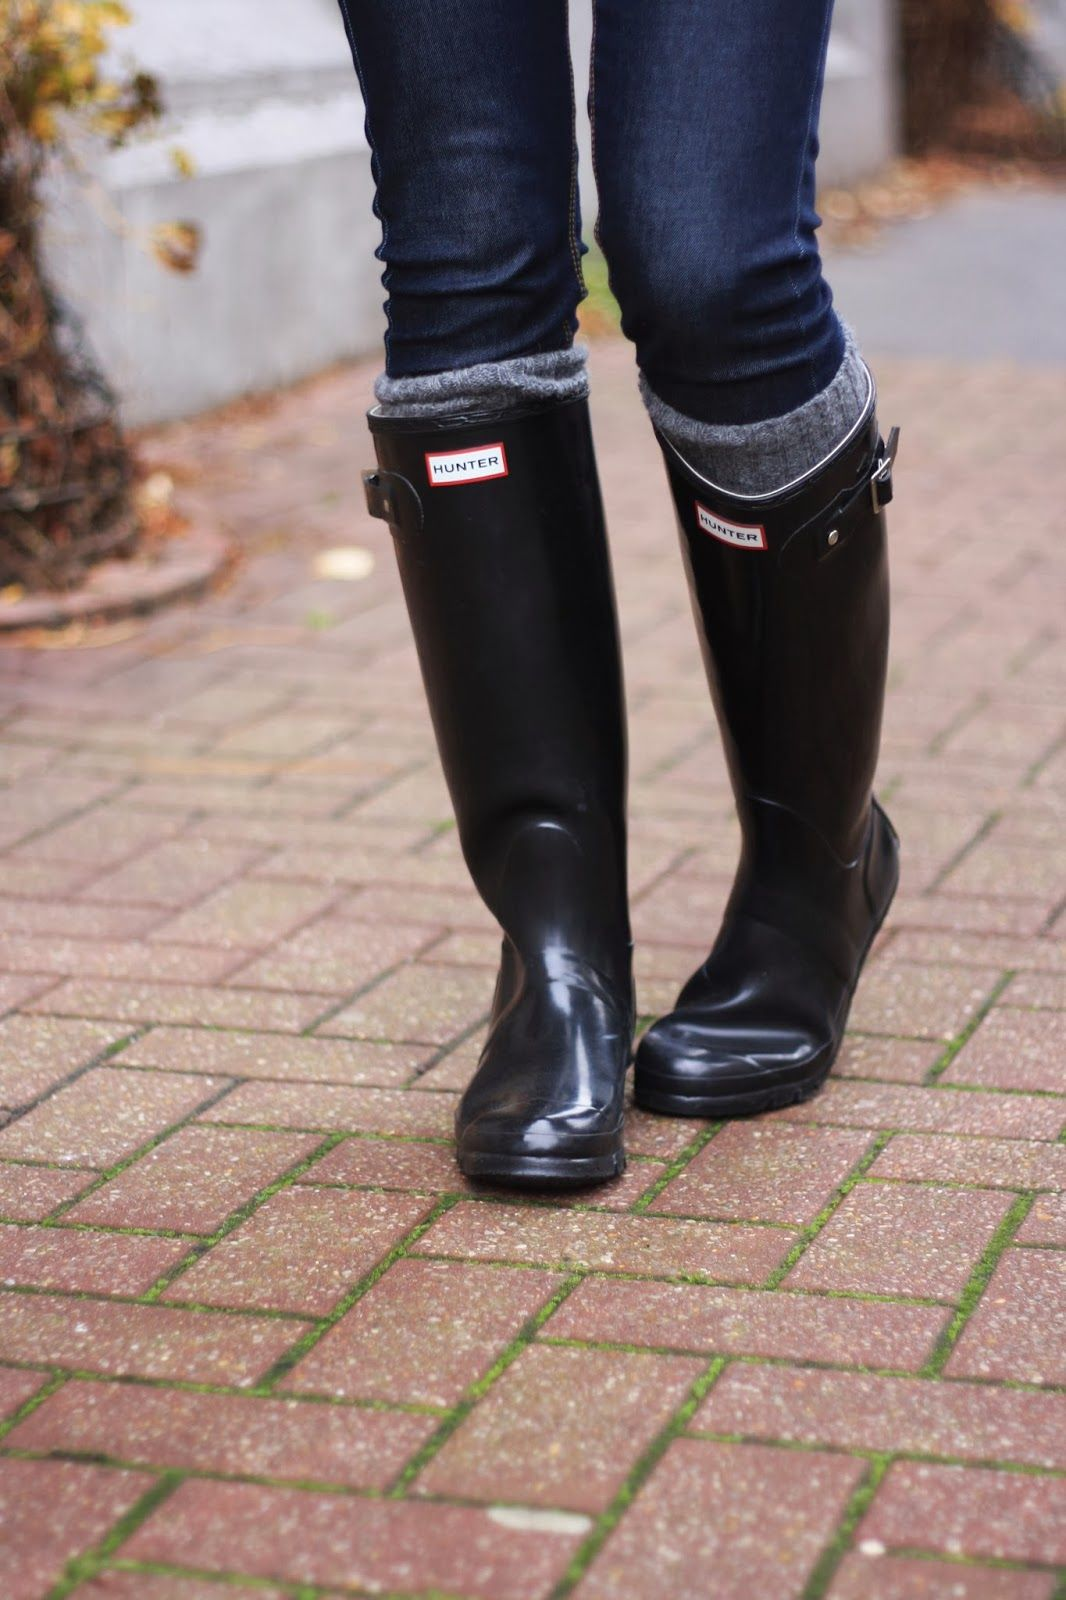 bottes Hunter noir Bottes Hunter Femme, Bottes De Pluie Hunter, Bottes  Femme Noir,